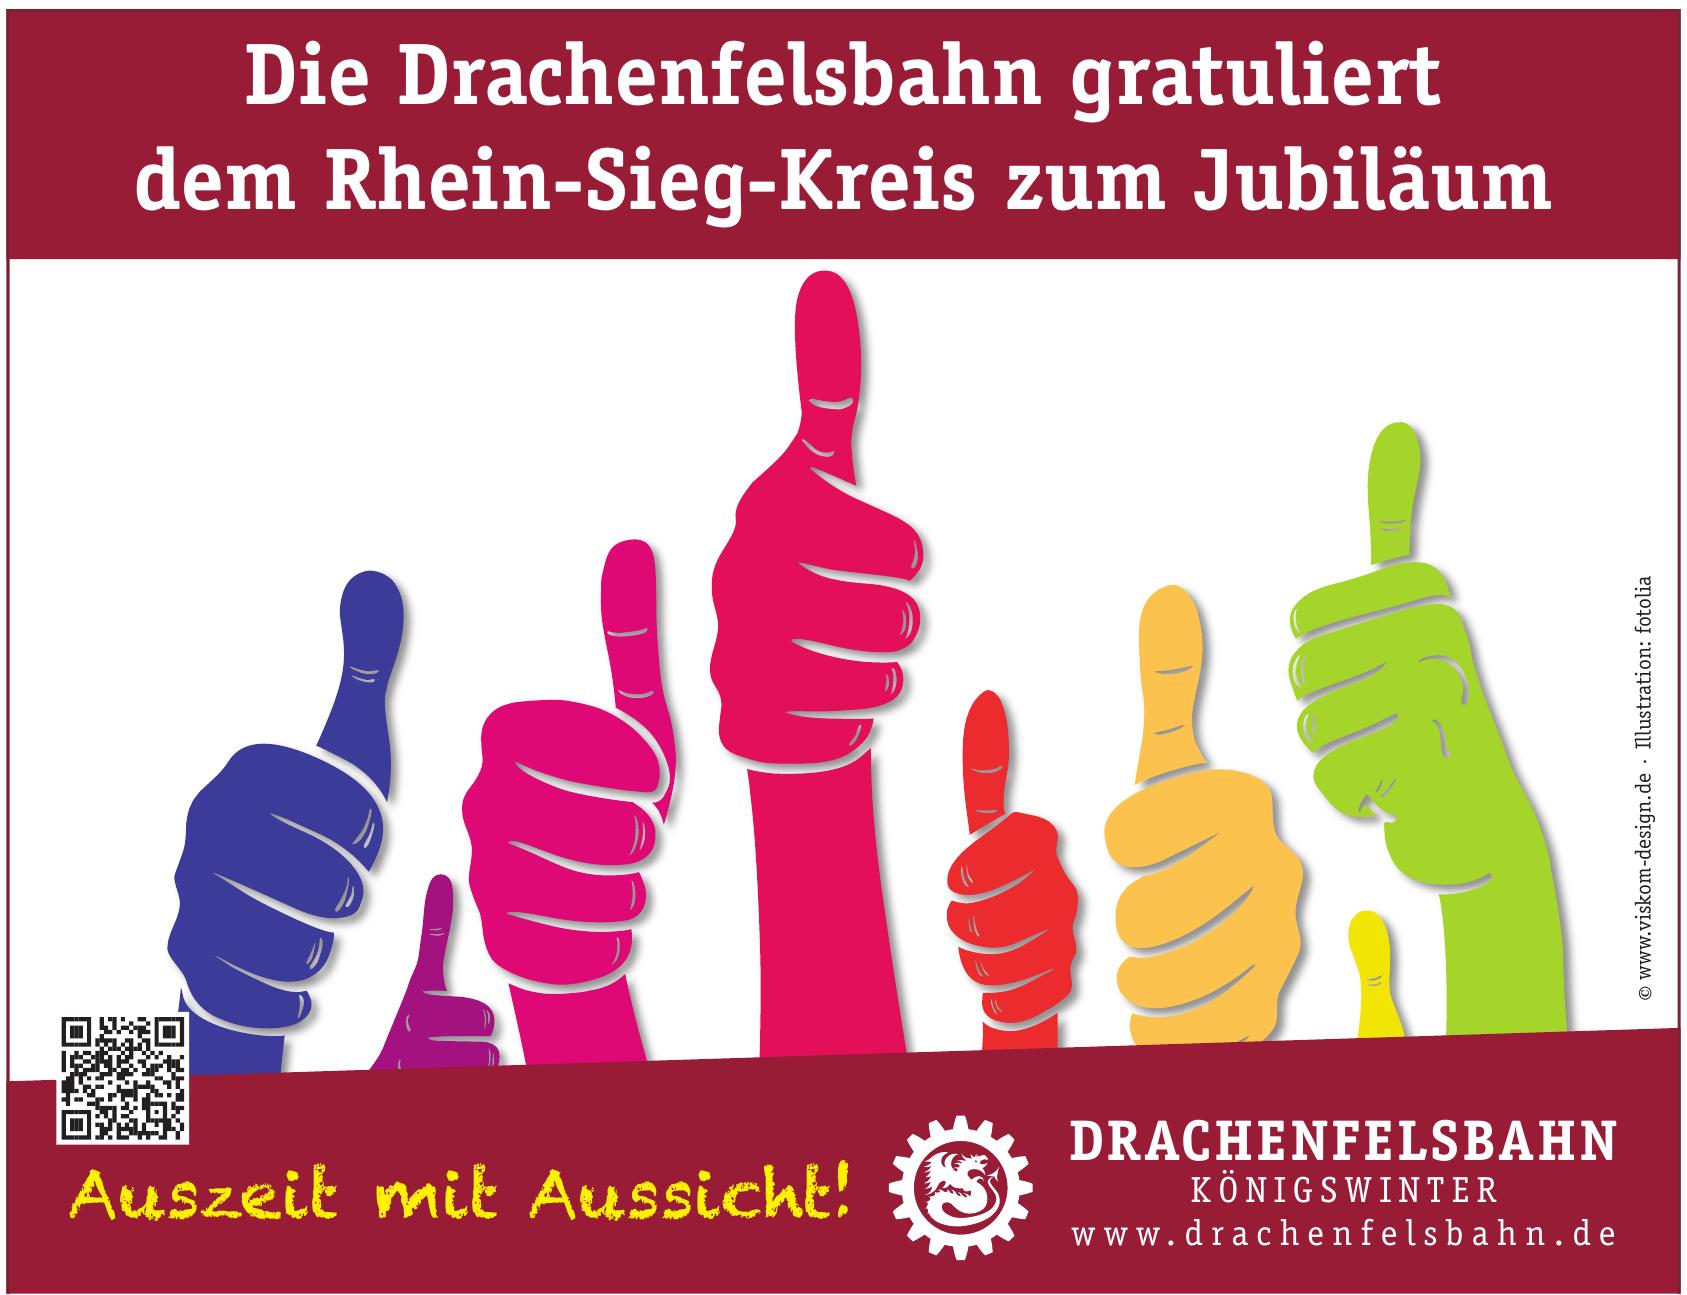 Drachenfelsbahn Königswinter